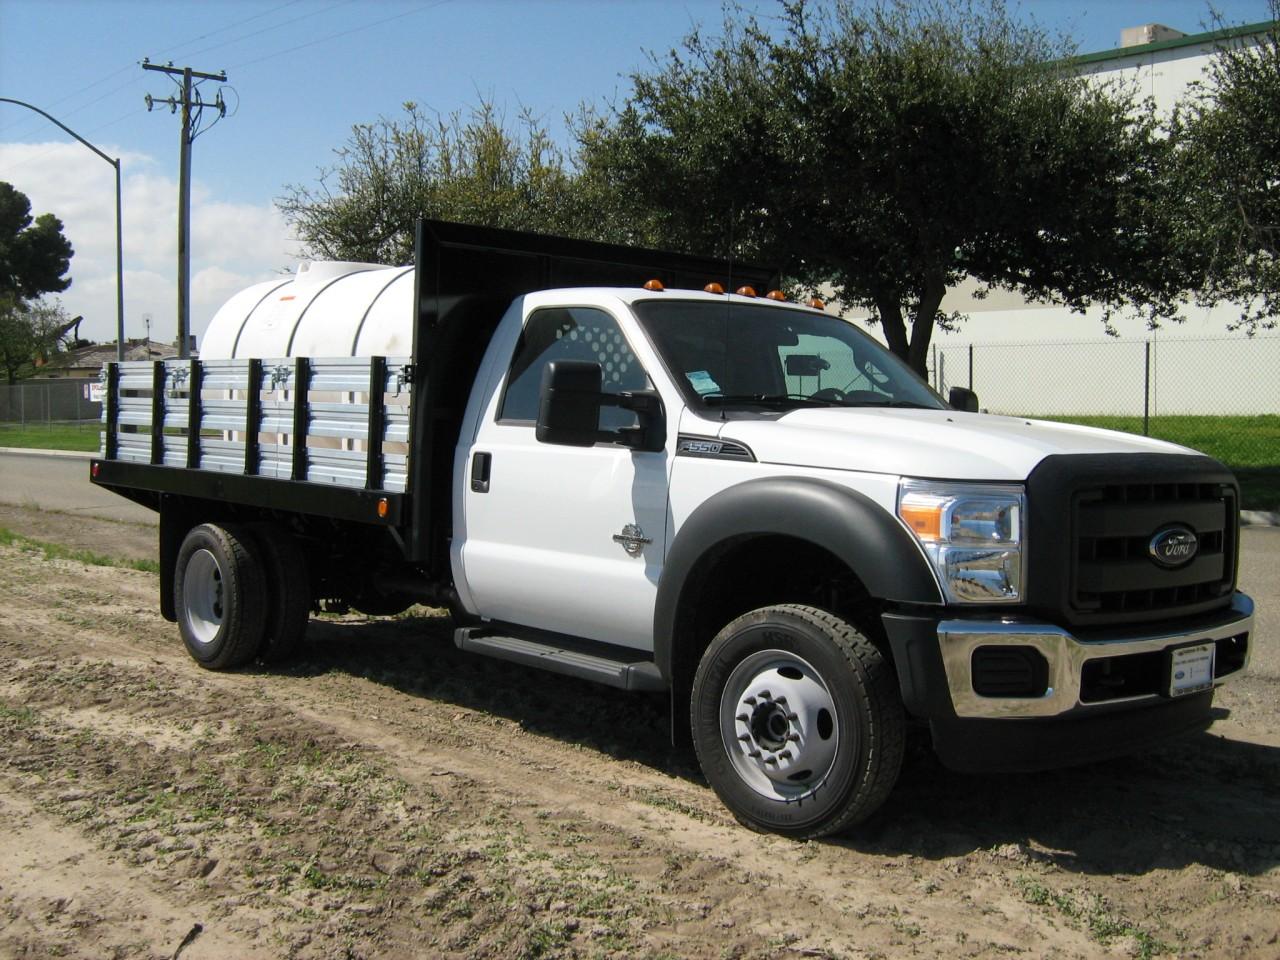 Used Flatbed Dump Trucks Fresno Ca Used Dump Truck Bodies For Sale Custom Built Flatbeds For Pickups